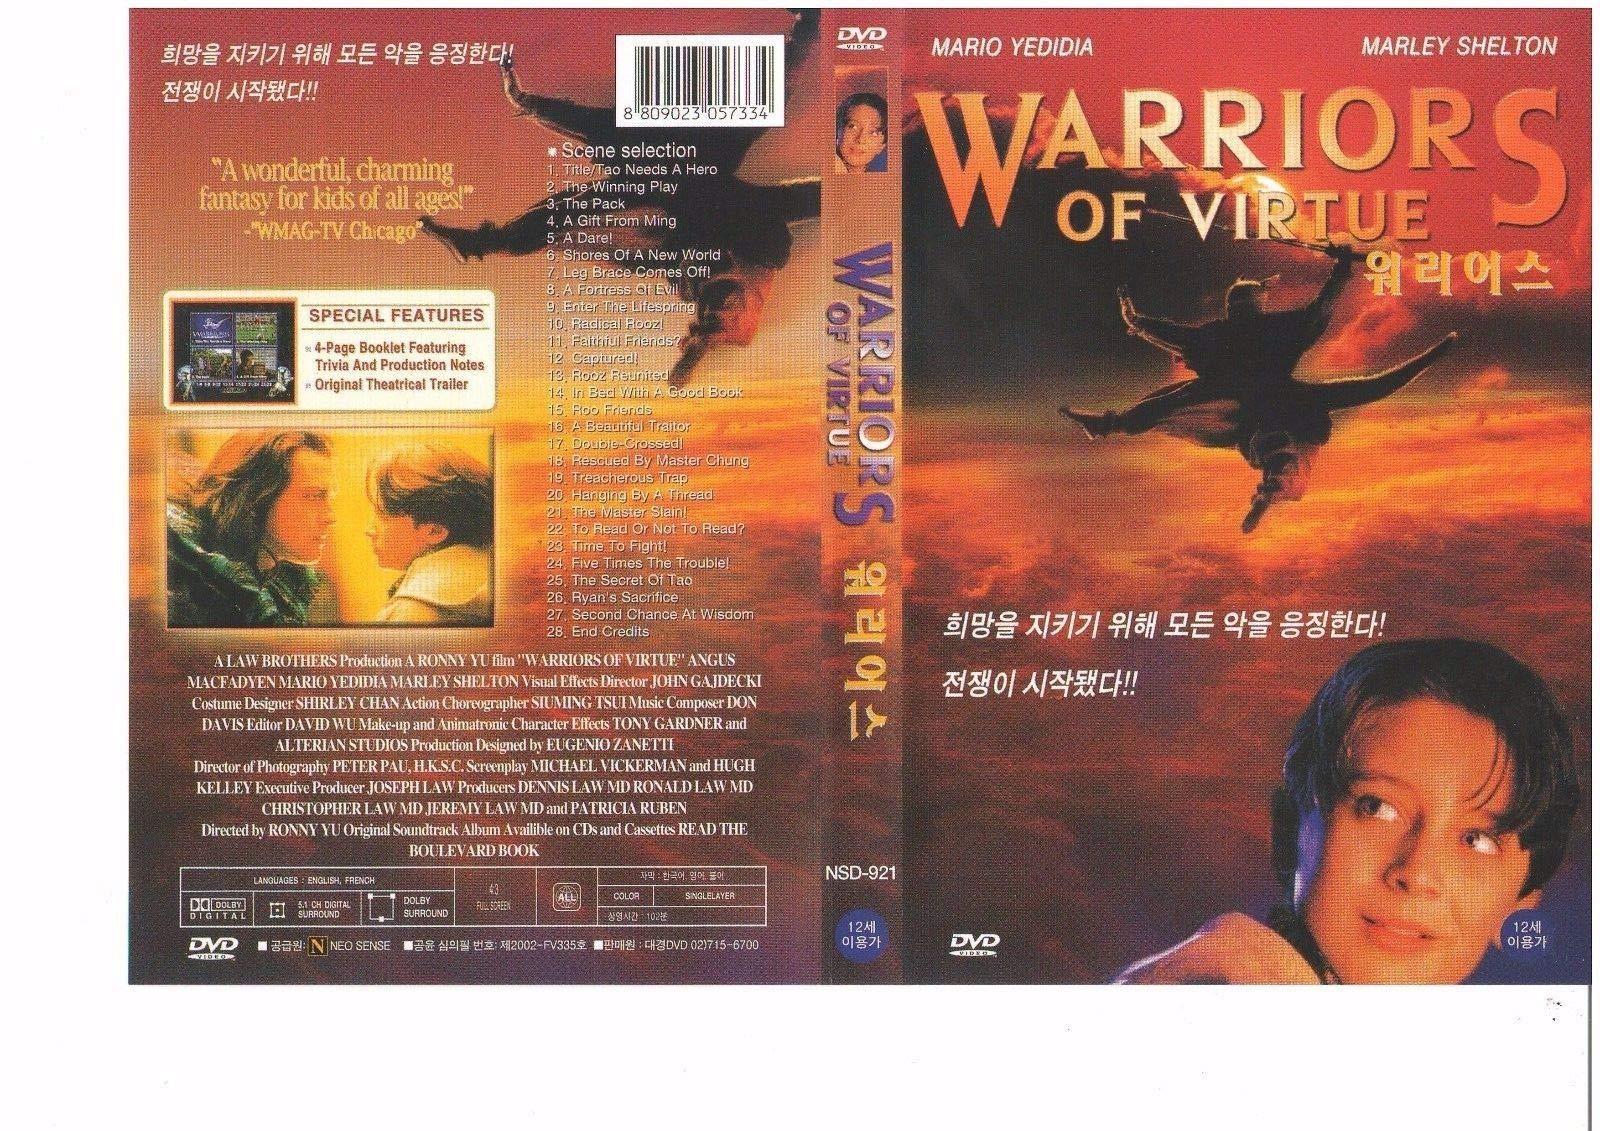 Warriors of Virtue (1997) DVD Angus Macfadyen by 474 (Image #2)